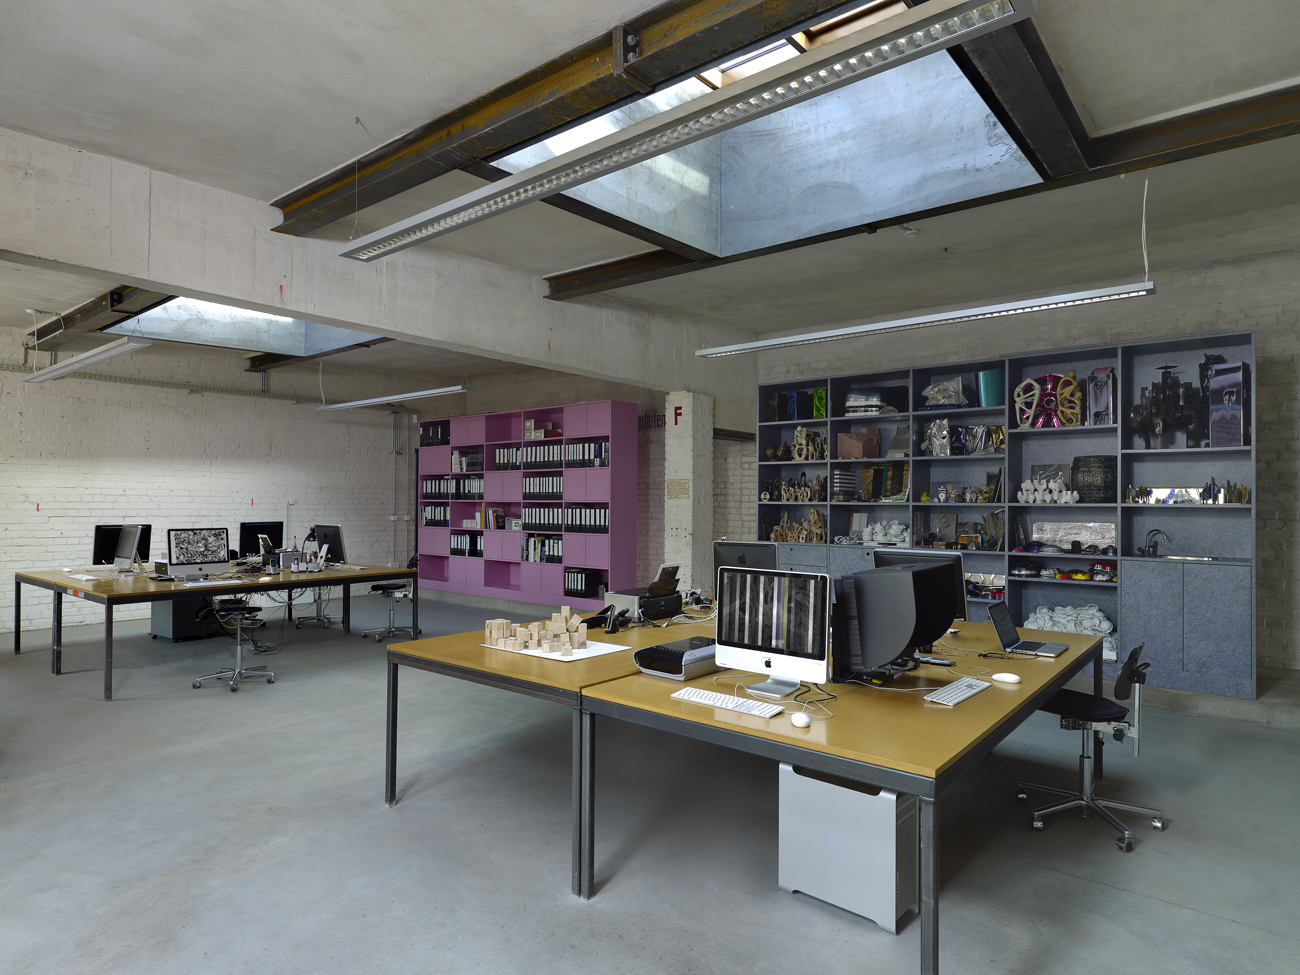 atelier-anselm-reyle-7-tanja-lincke-architekten